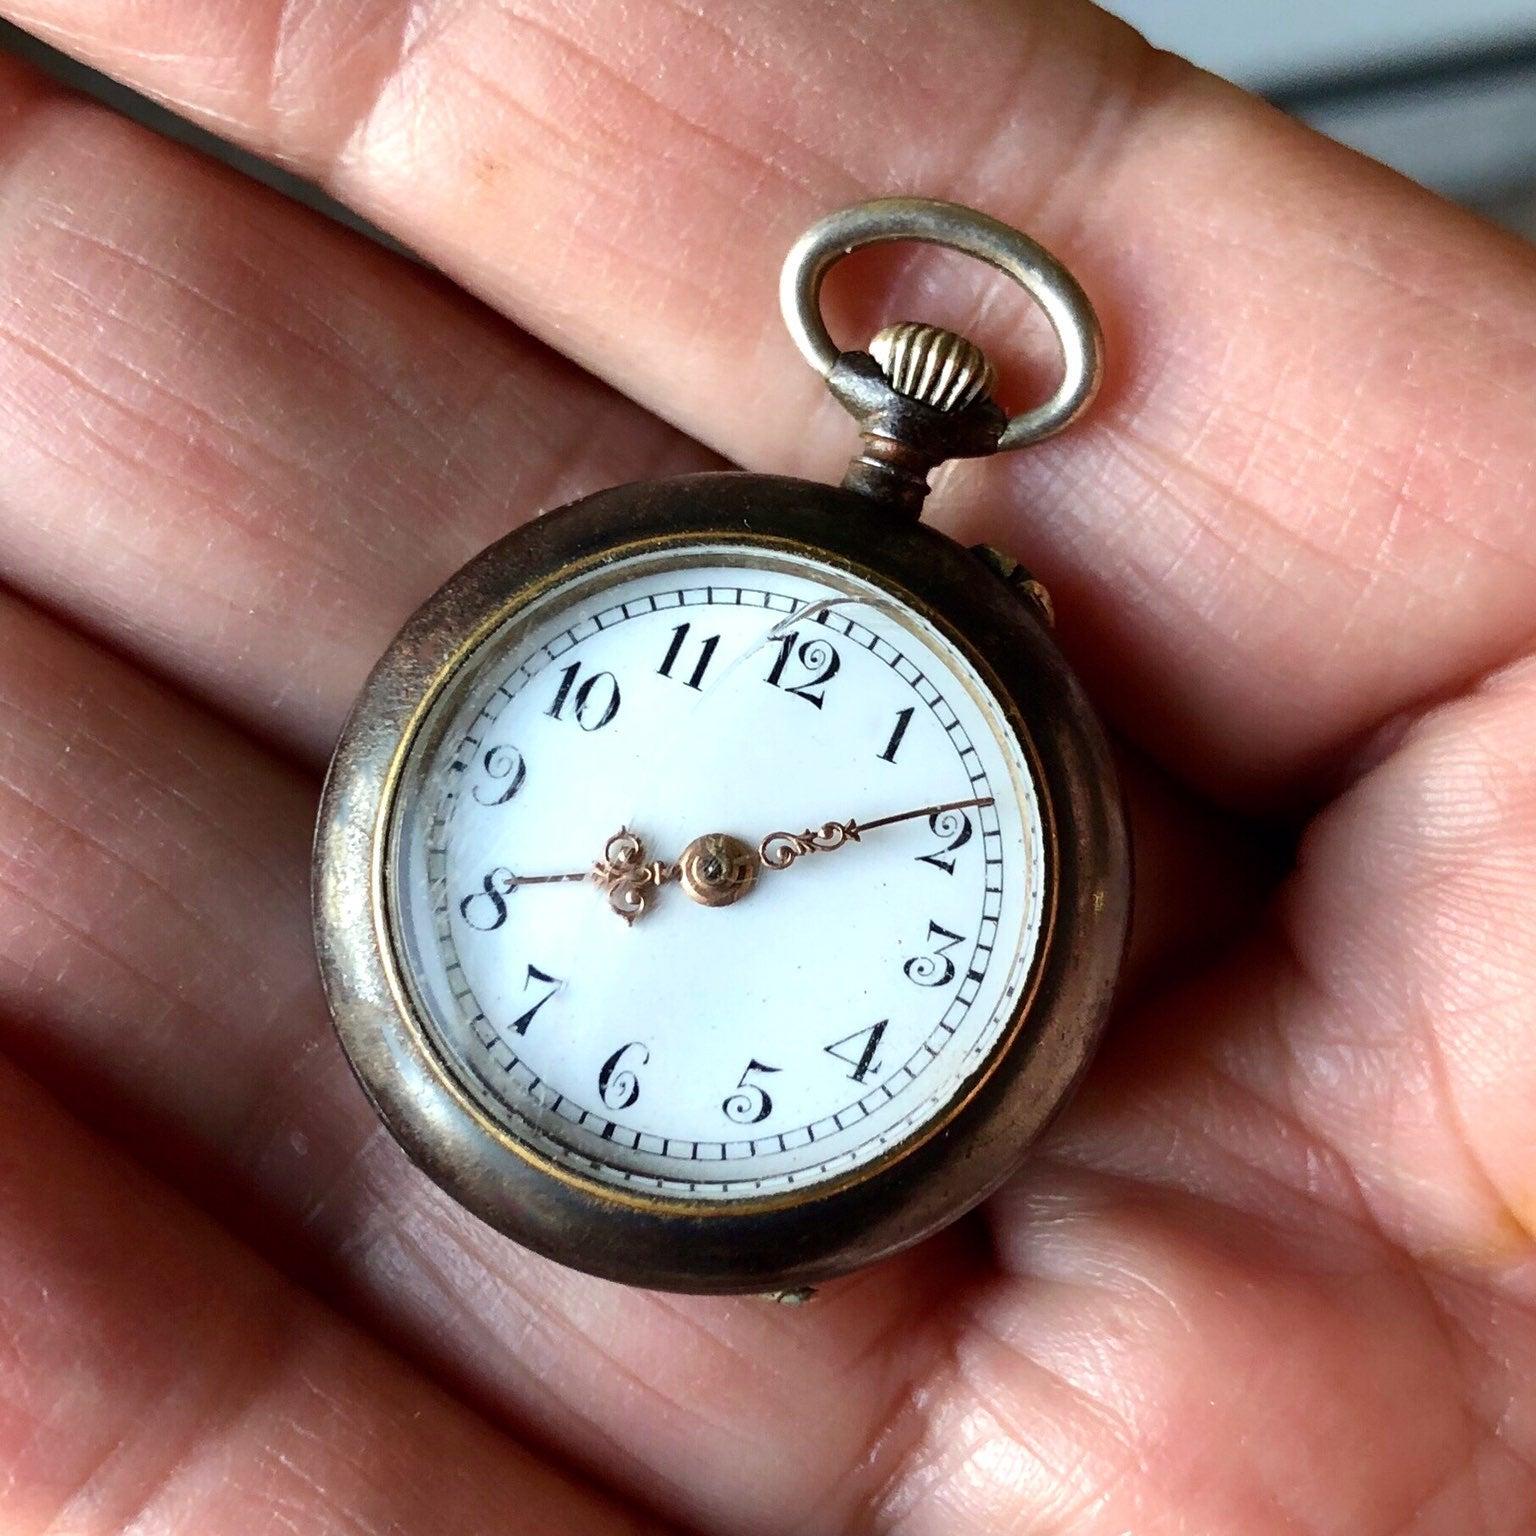 ANTIQUE Swiss OF Pocket Watch 28.0mm